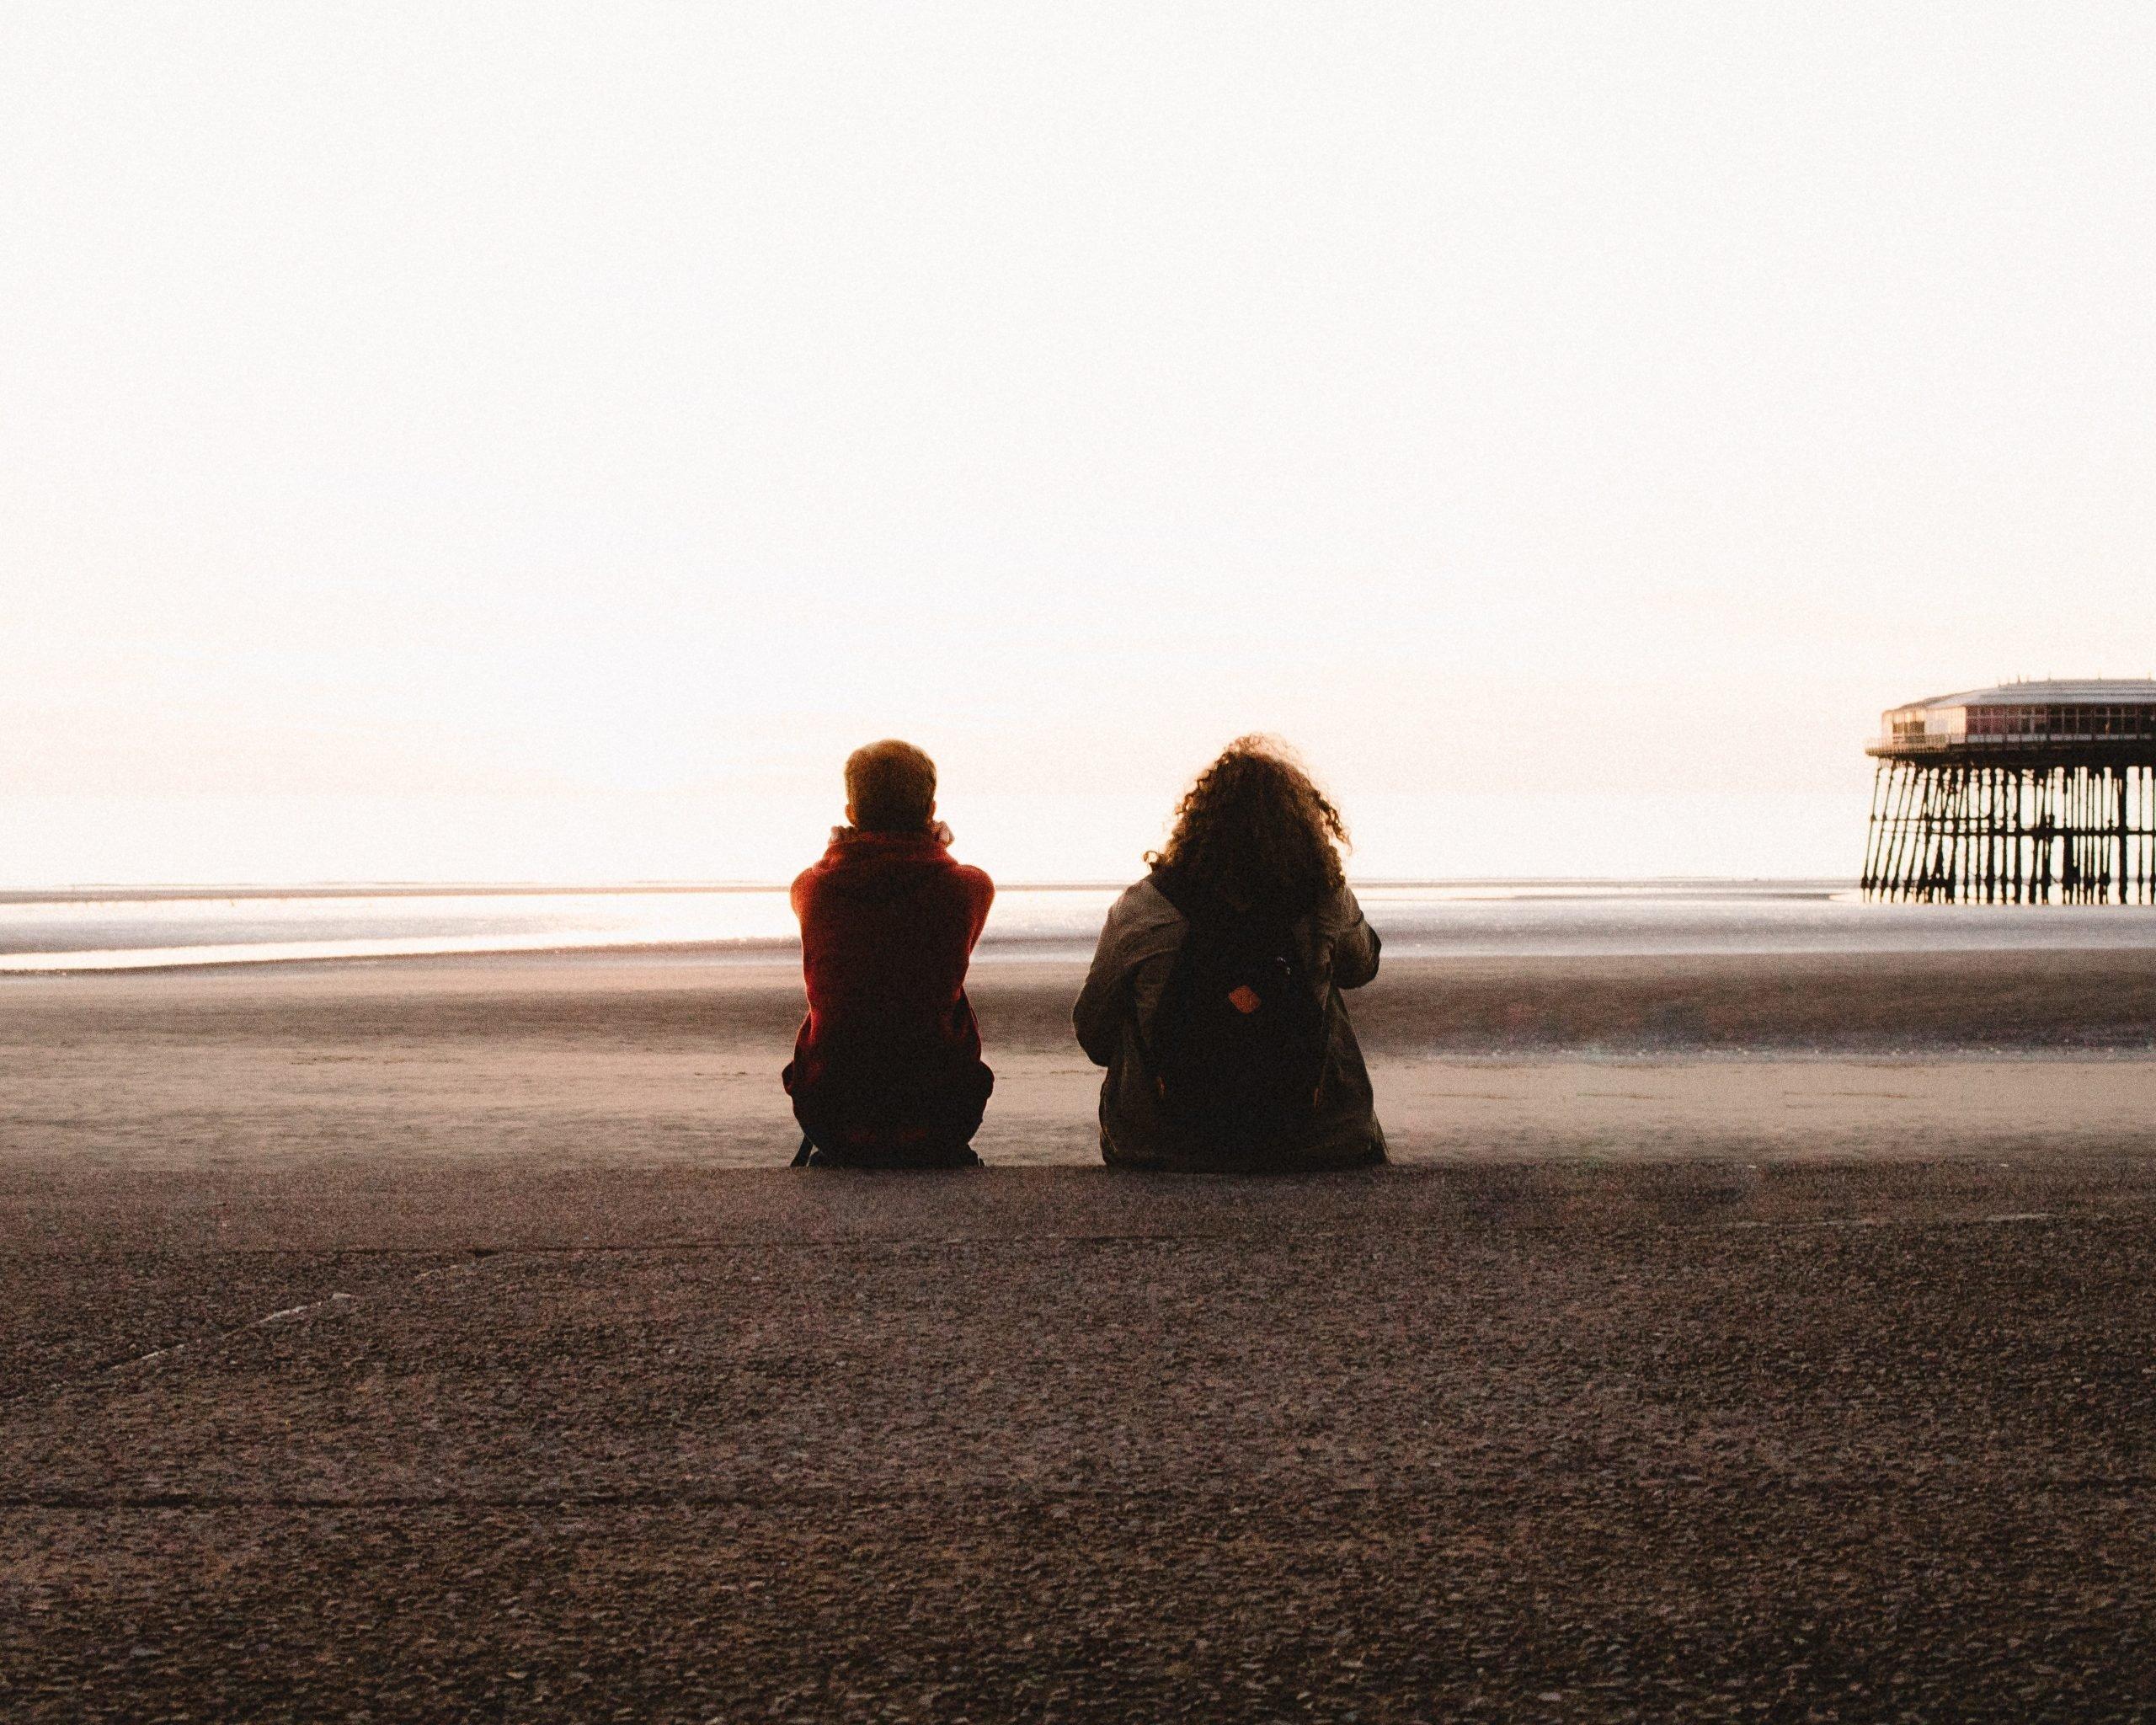 Friends on the beach talking